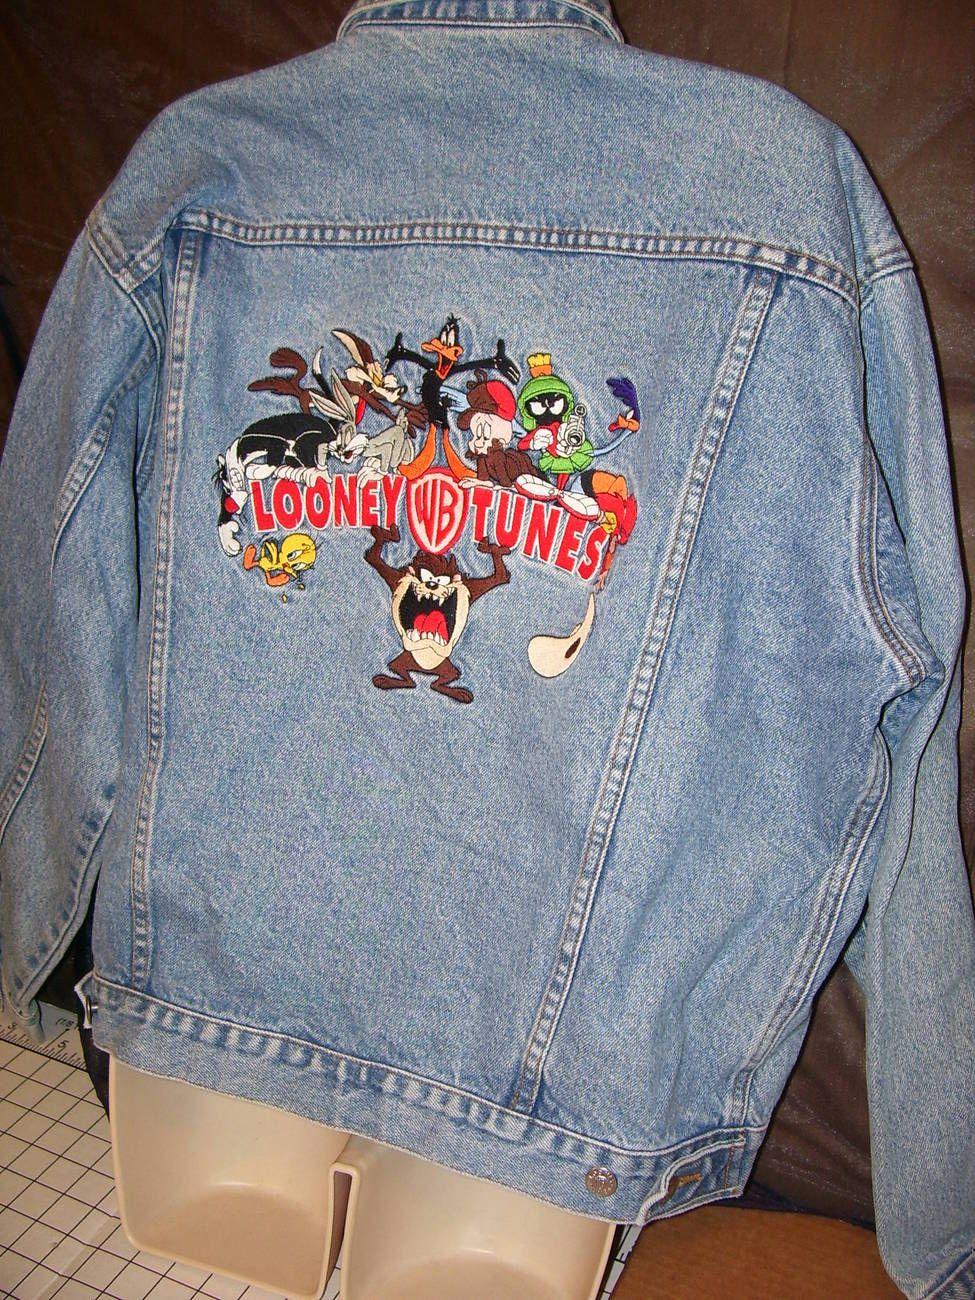 f7f0e61990 Warner Bros Studio Store Looney Tunes Denim Jacket Adult M Yosemite Sam  Elmer  12.50